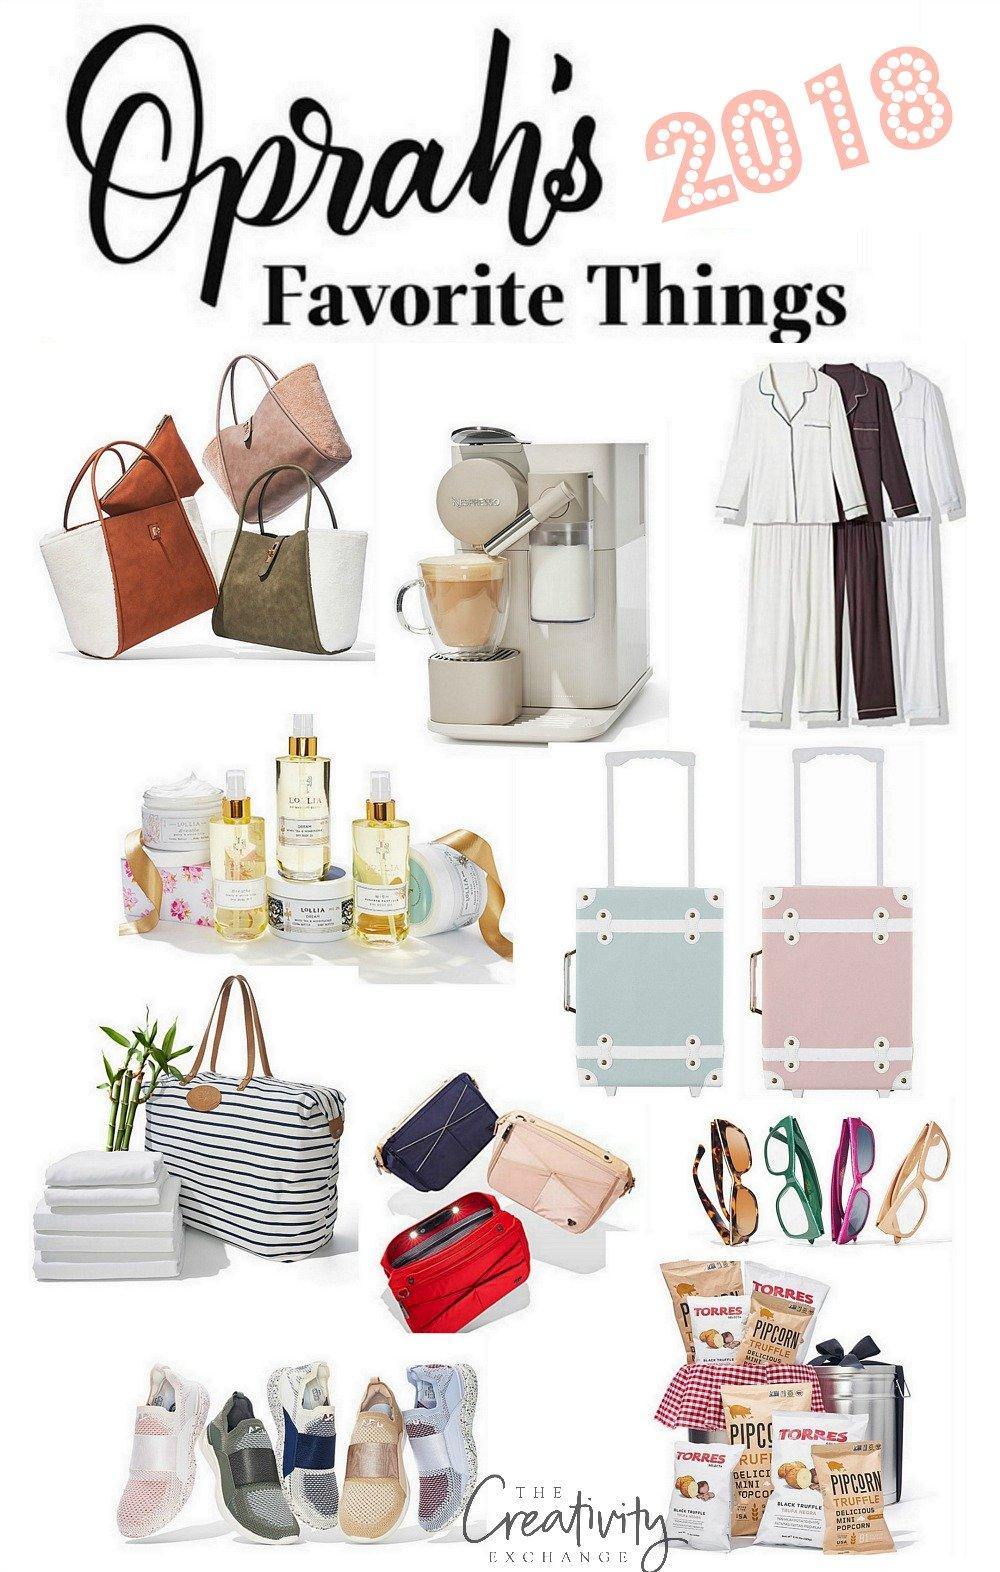 oprah 39 s favorite things 2018 on amazon. Black Bedroom Furniture Sets. Home Design Ideas